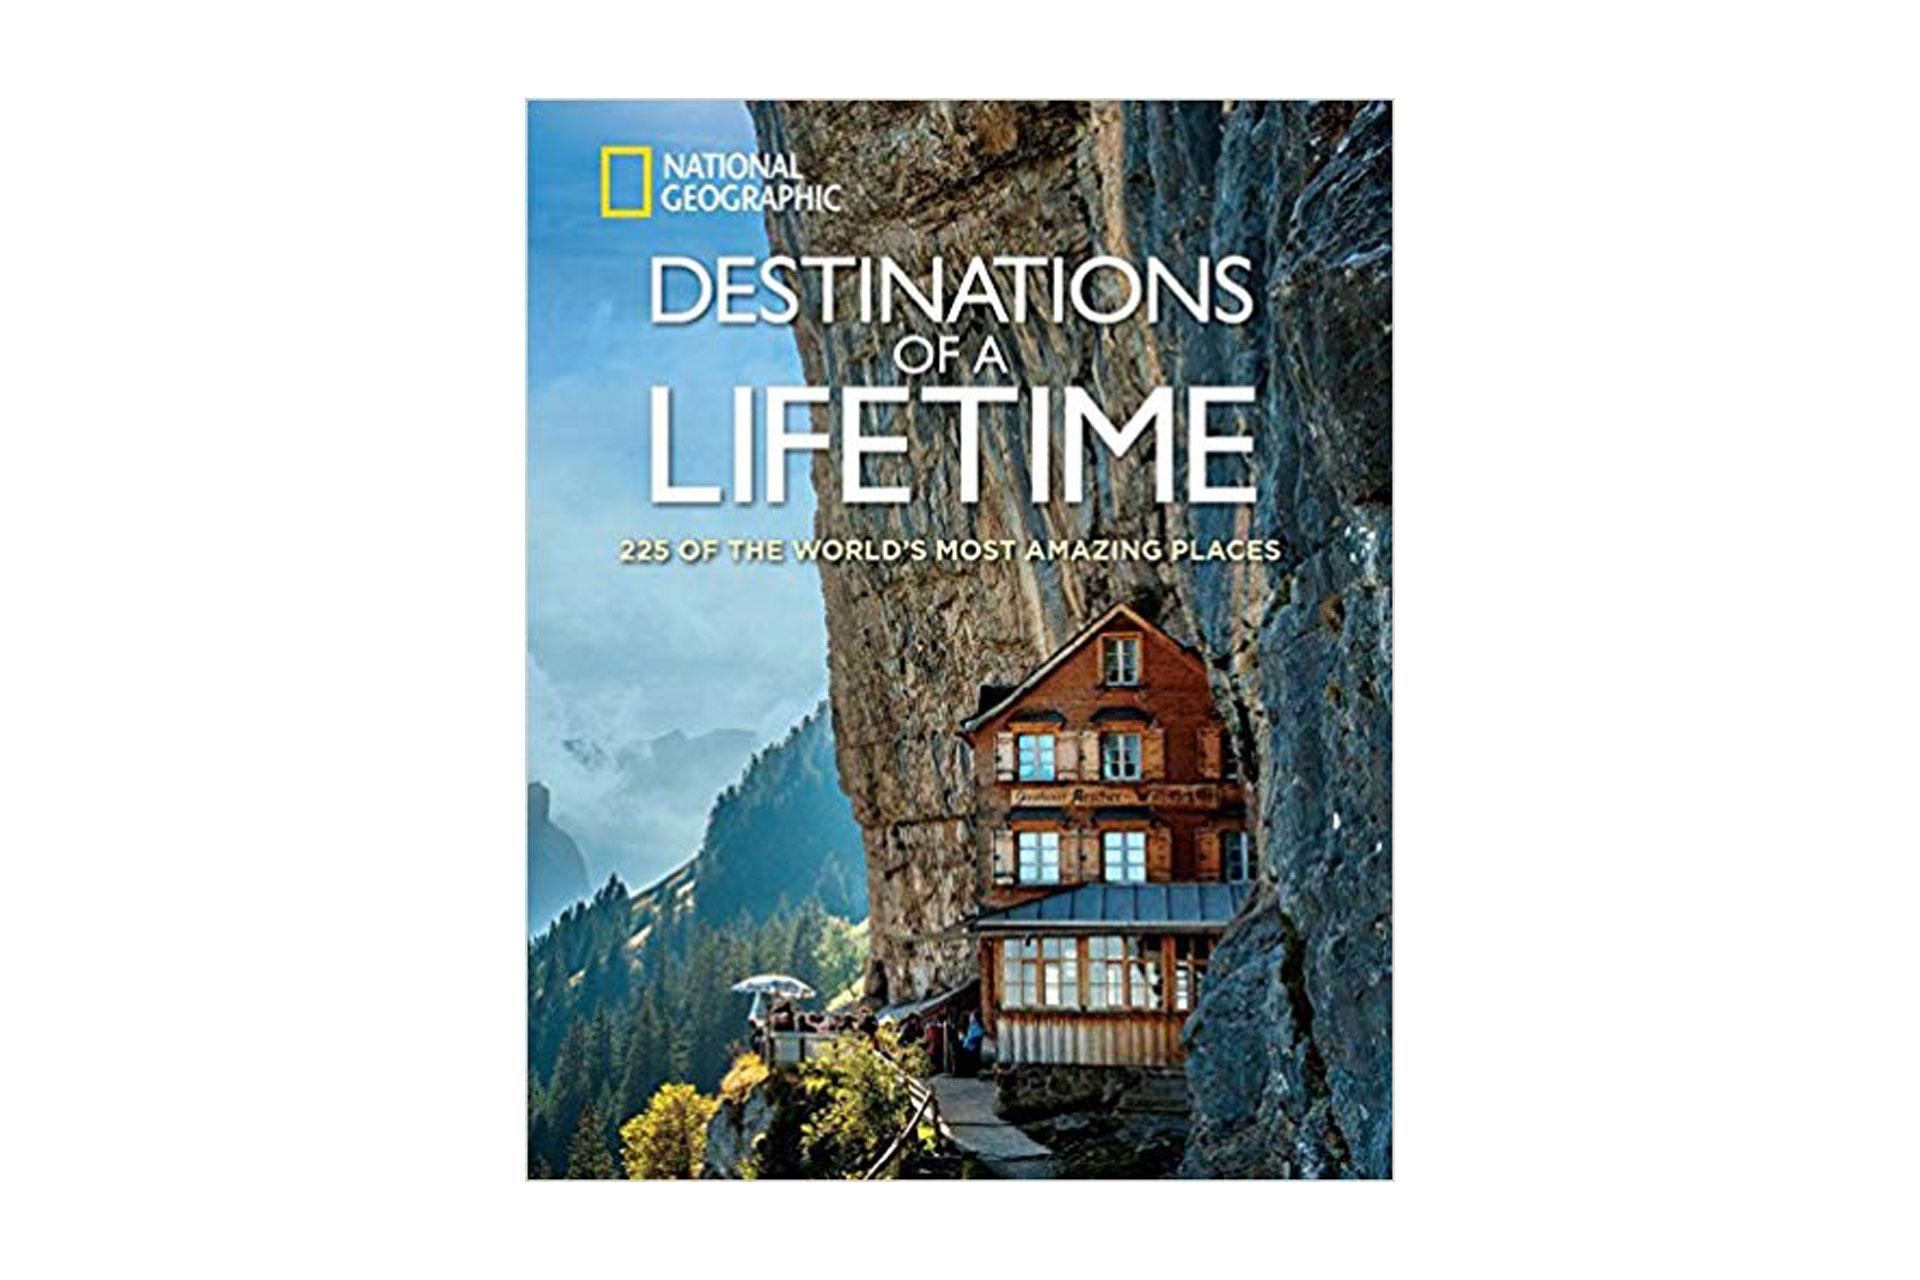 National Geographic Book; Courtesy of Amazon